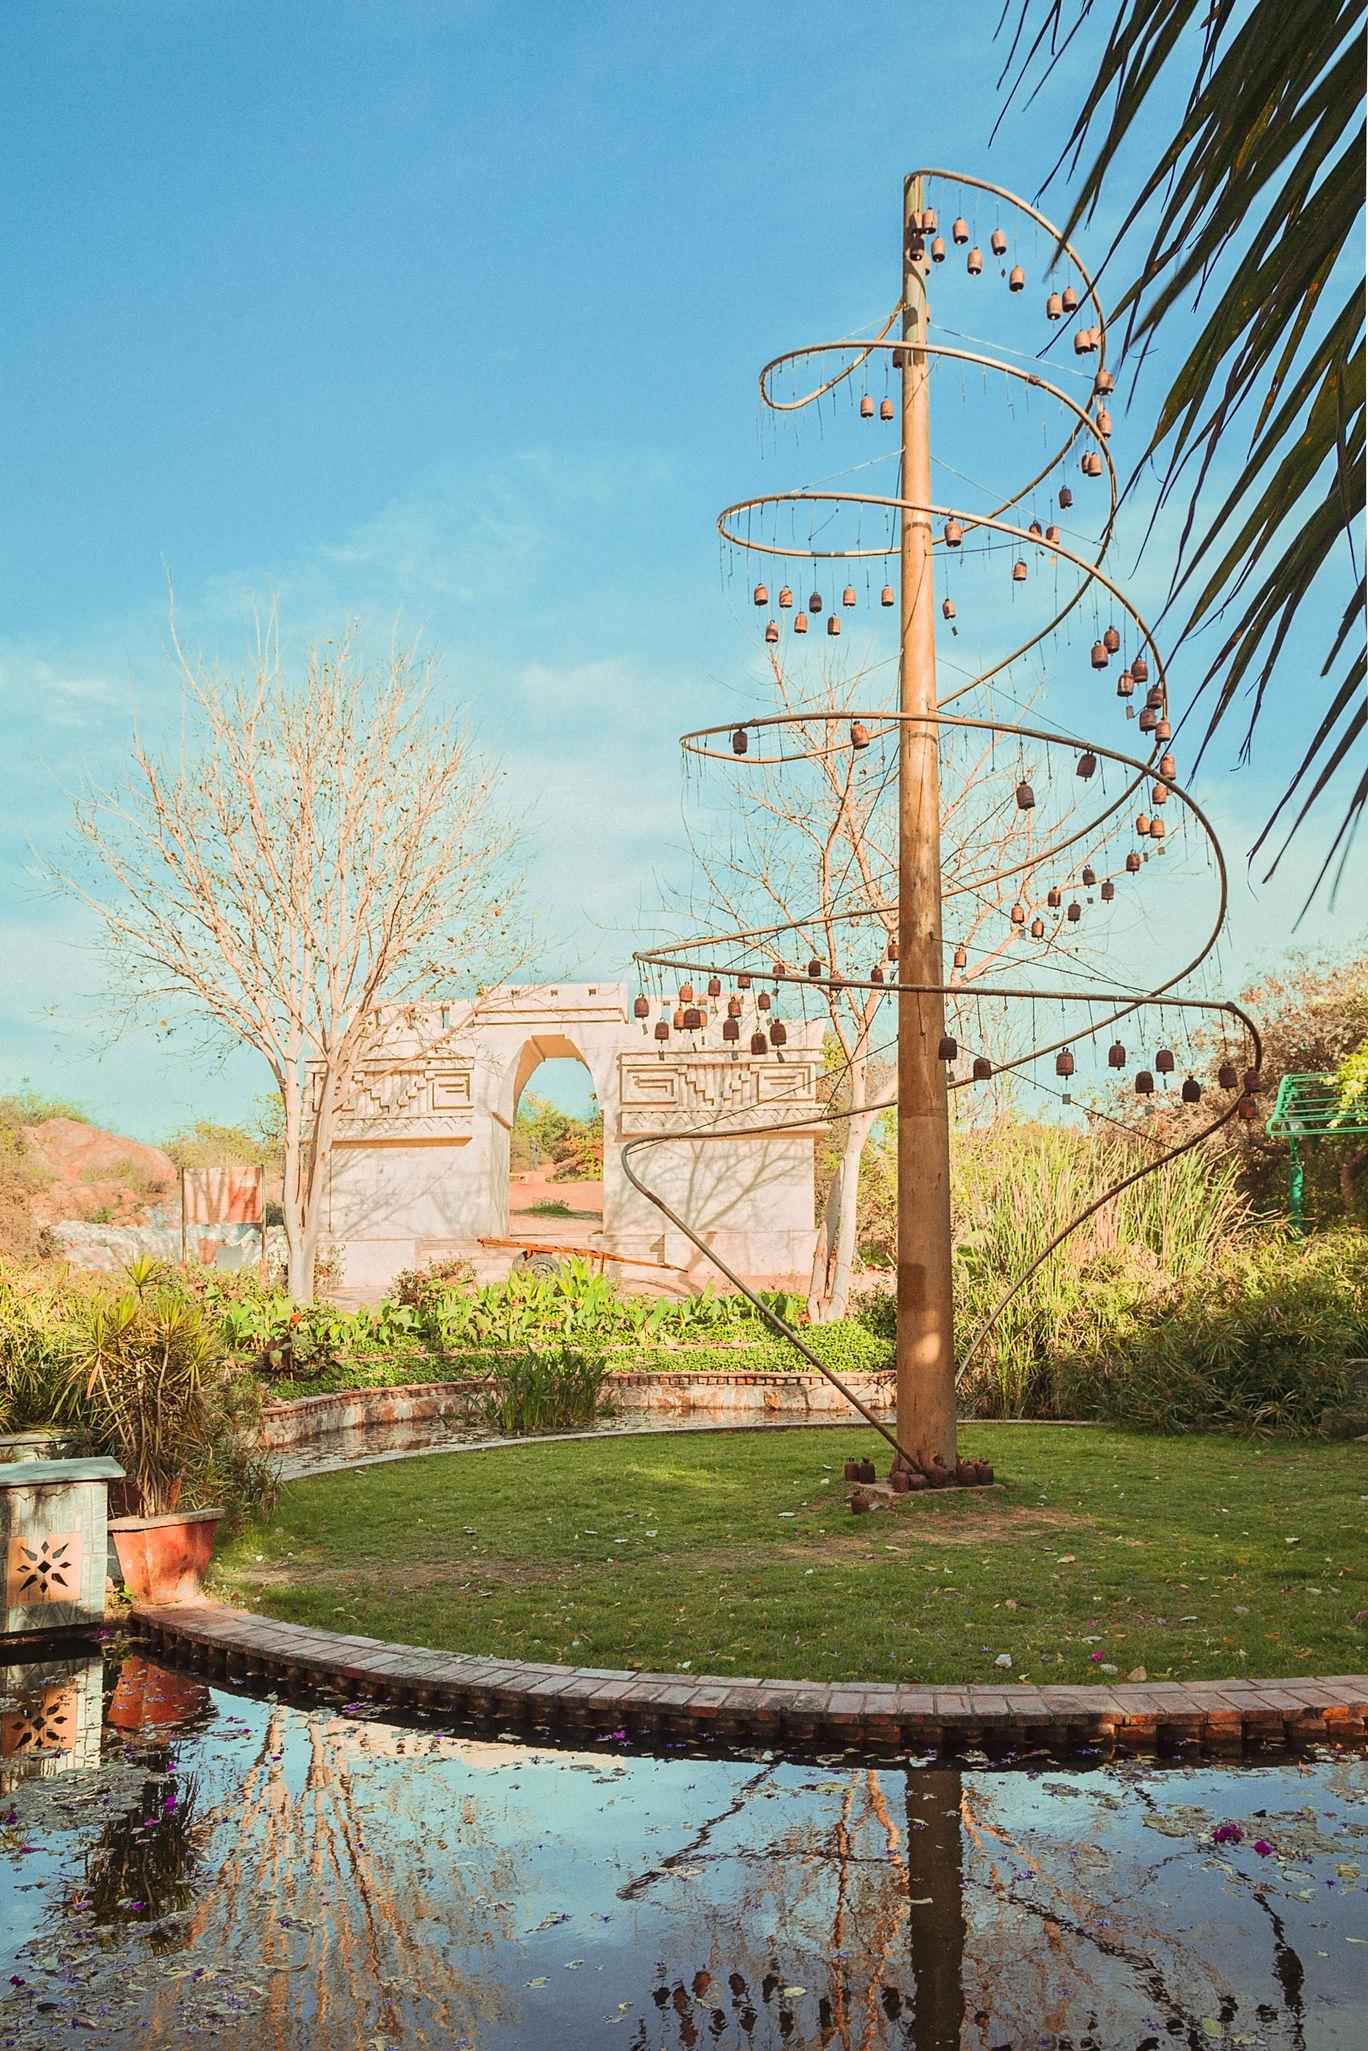 Photo of The Garden of Five Senses By Kunal Khurana